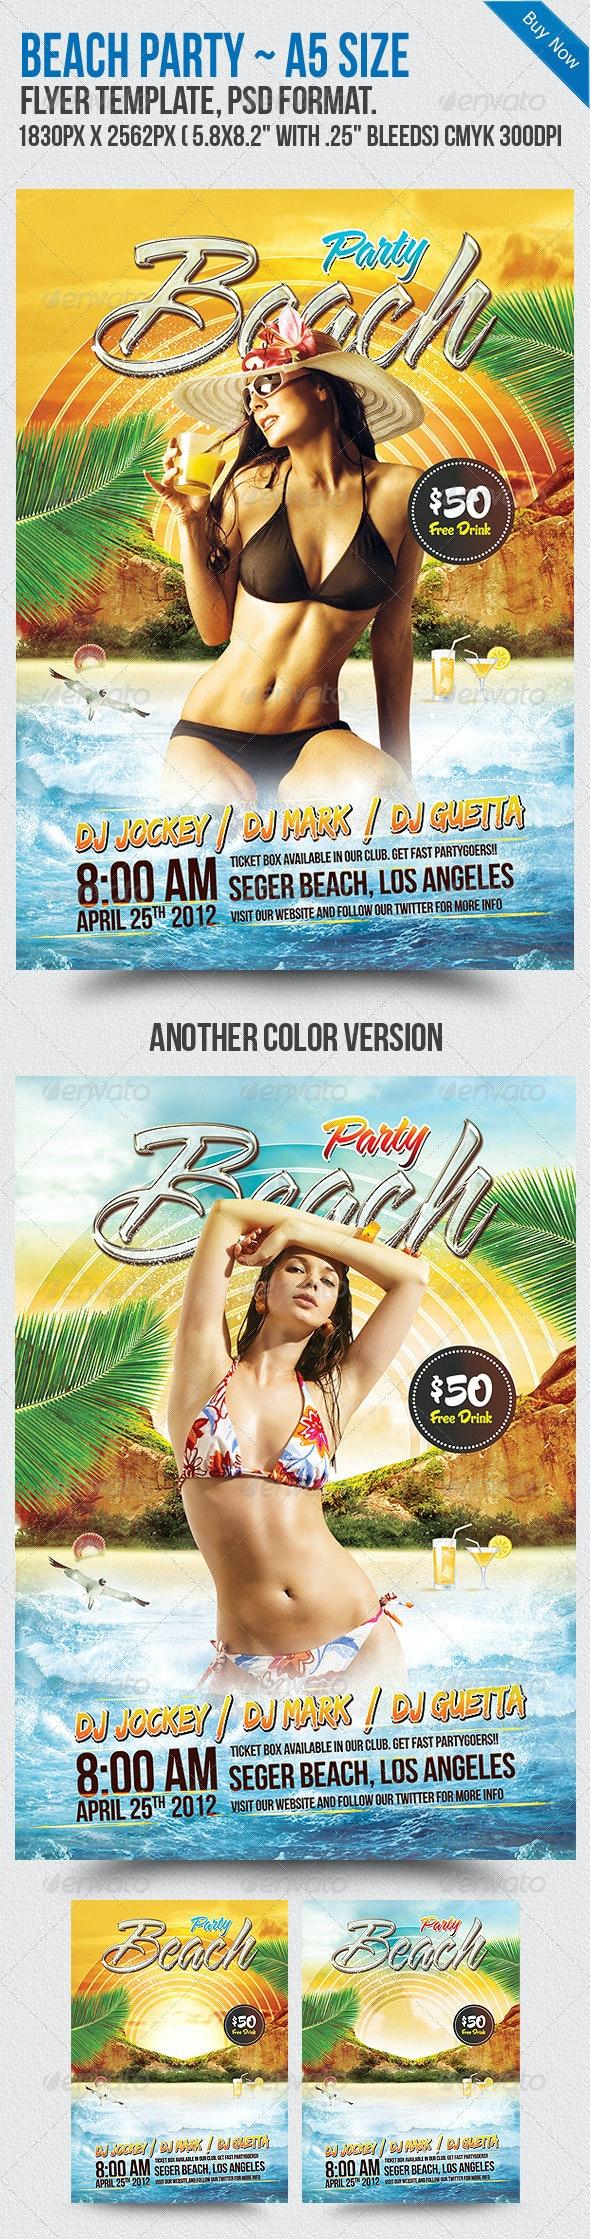 Beach Party A5 Flyer Template - Flyers Print Templates